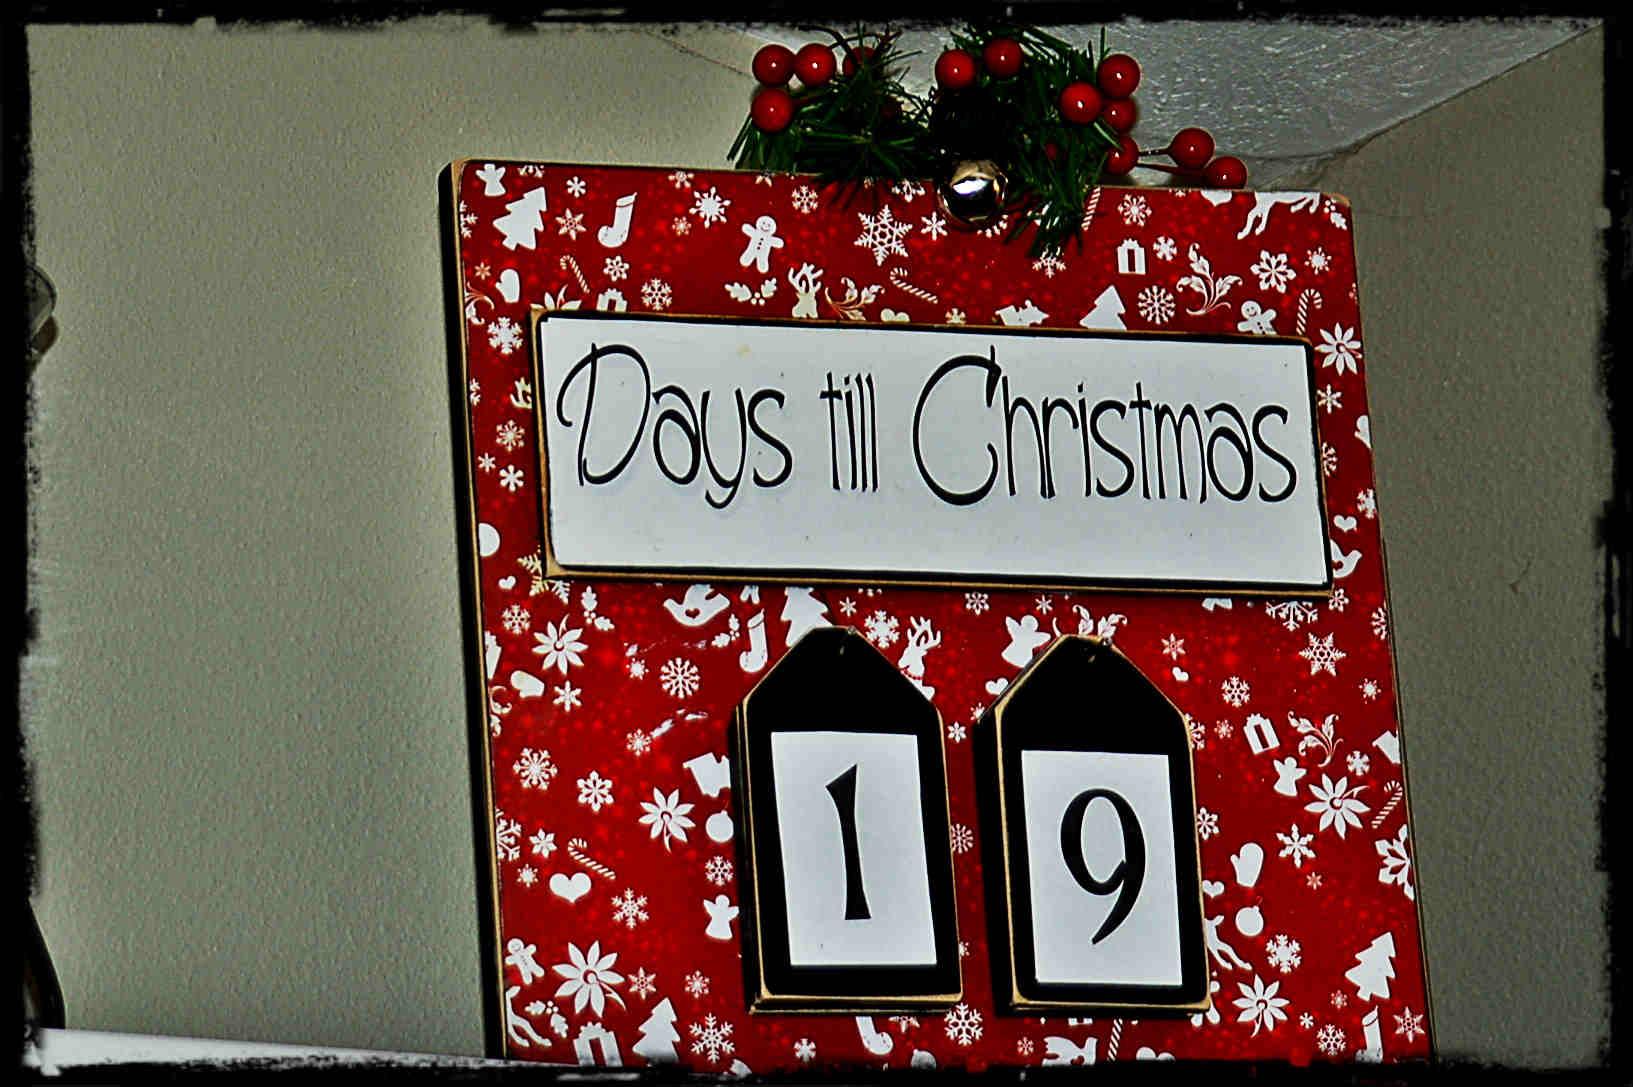 19-days-til-christmas.jpg